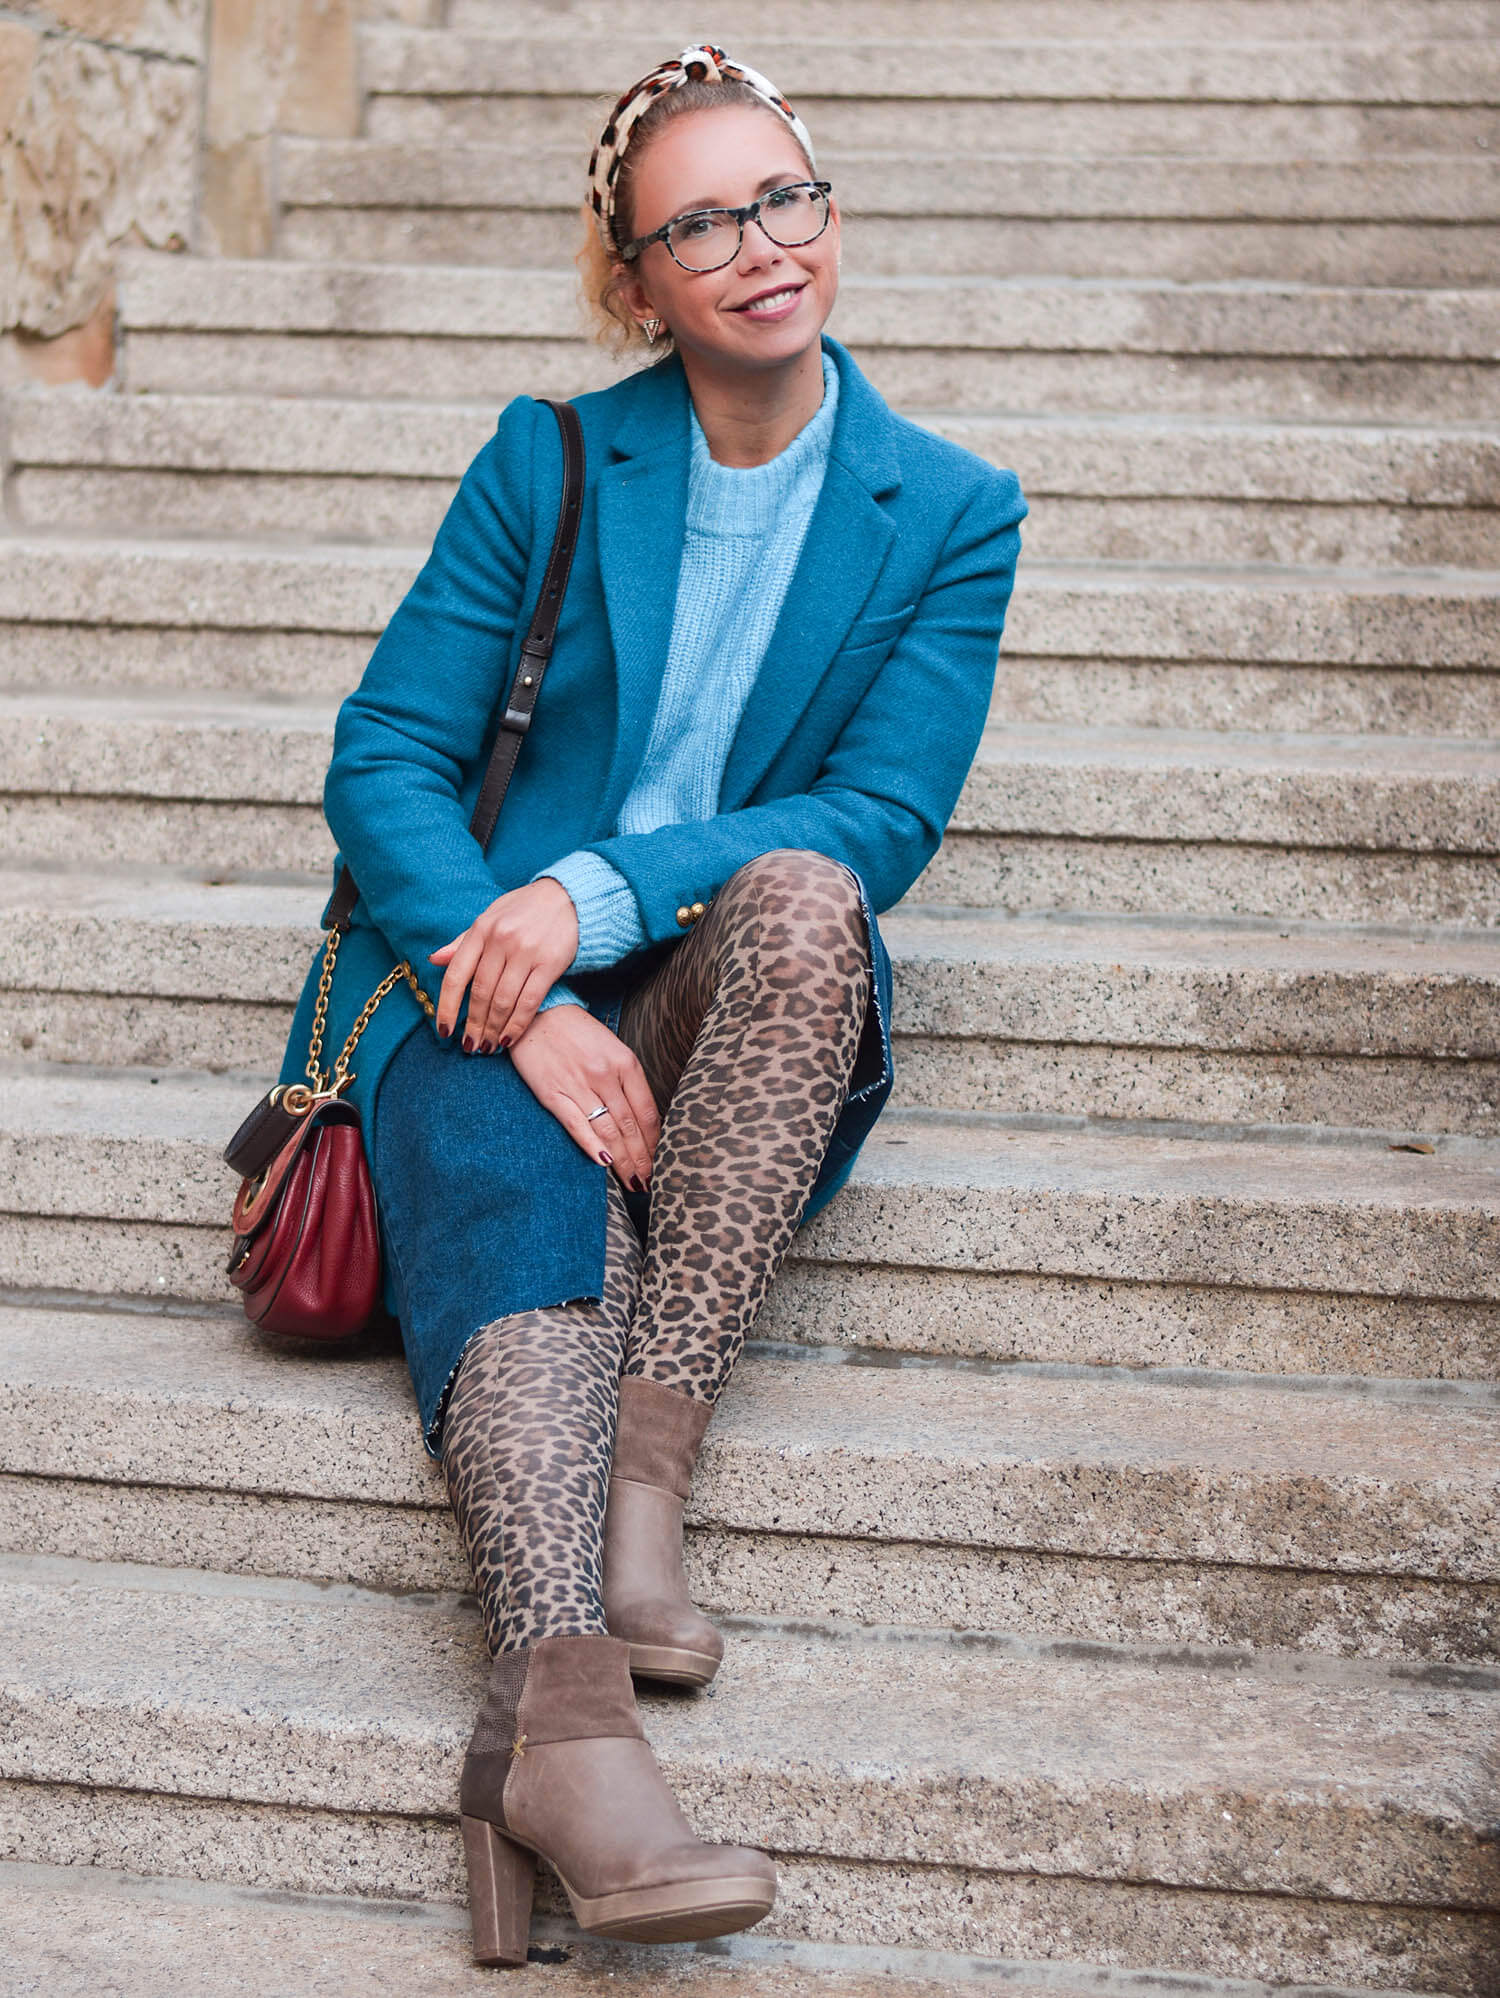 Petrol-Blue-meets-Leo-Print-Wool-Coat-Knit-Denim Skirt-Kationette-Winter-Outfit-Fashionblogger-Germany